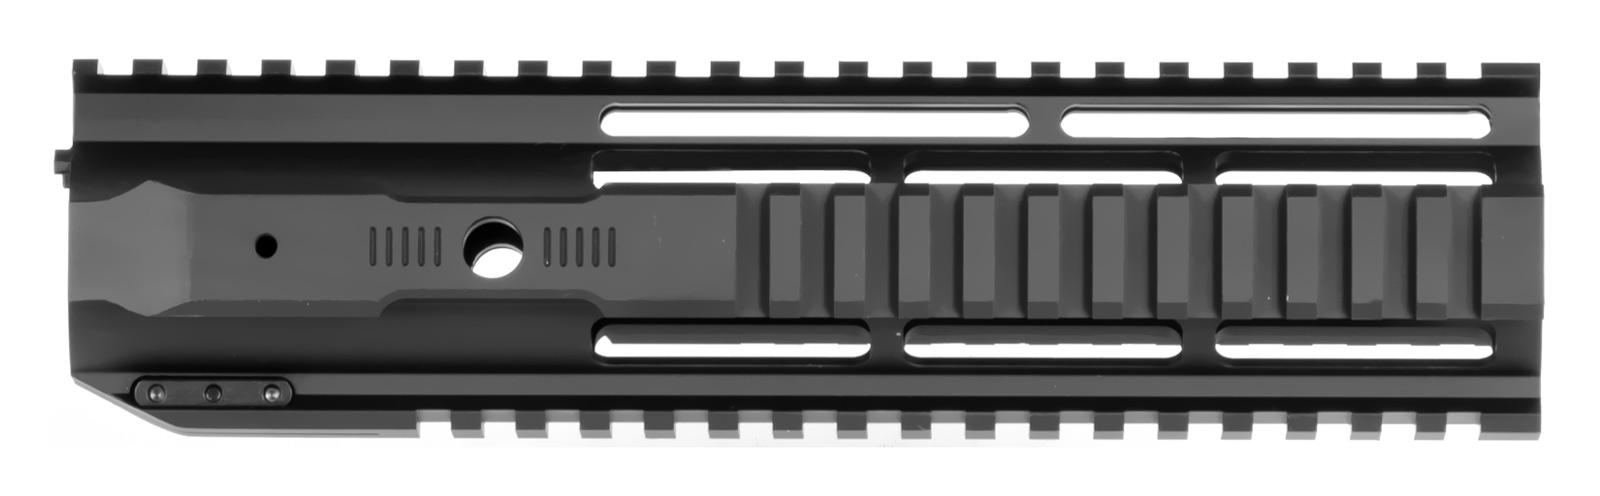 ar-15-rail-9-hera-arms-quad-rail-ar-15-handguard-unmarked